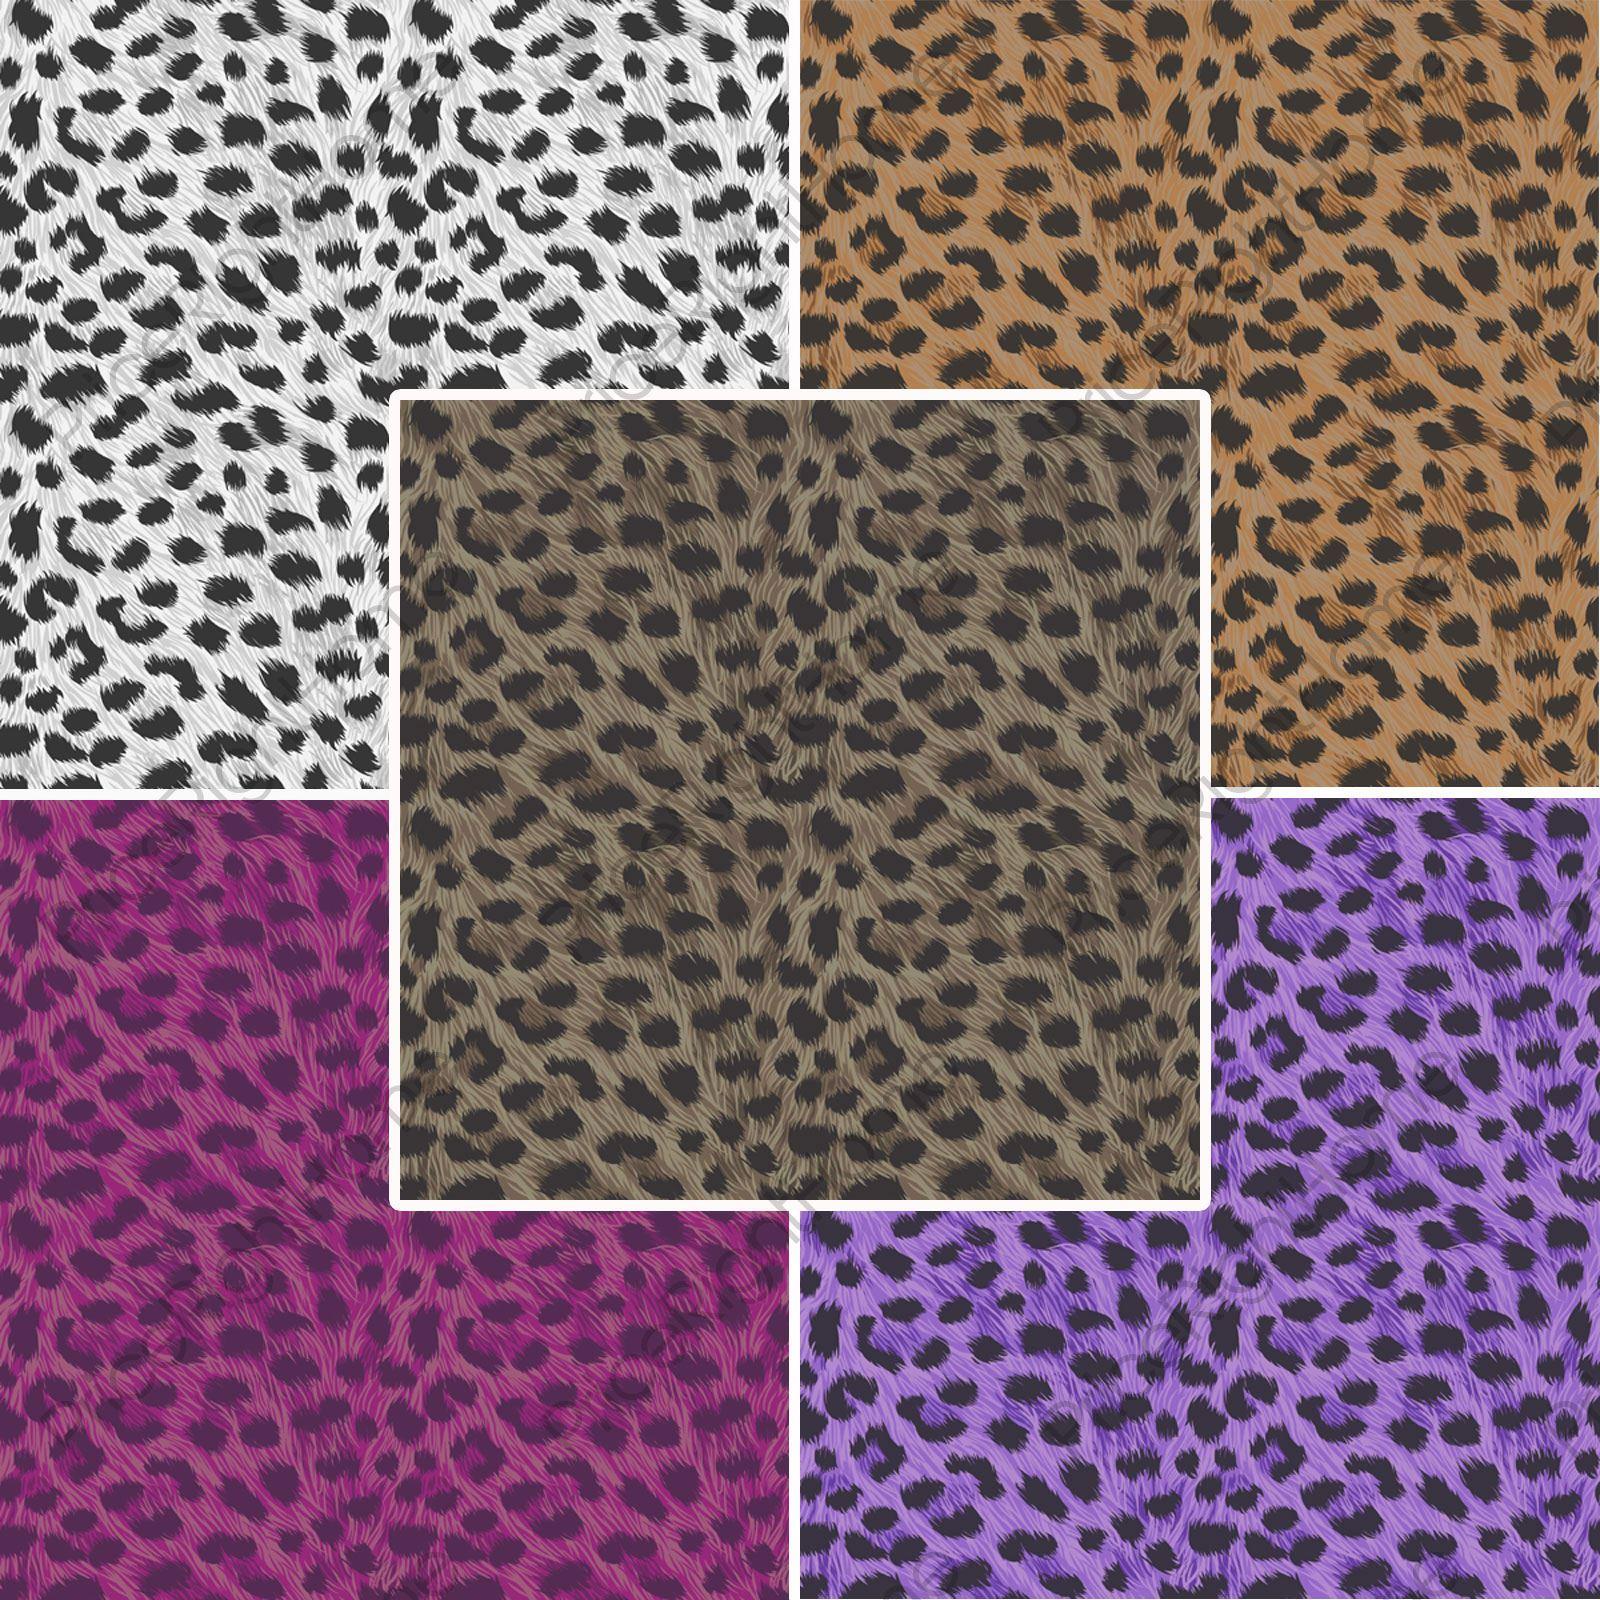 leoparden druck tapete tier aufdruck wandtapete lila golden brown white ebay. Black Bedroom Furniture Sets. Home Design Ideas